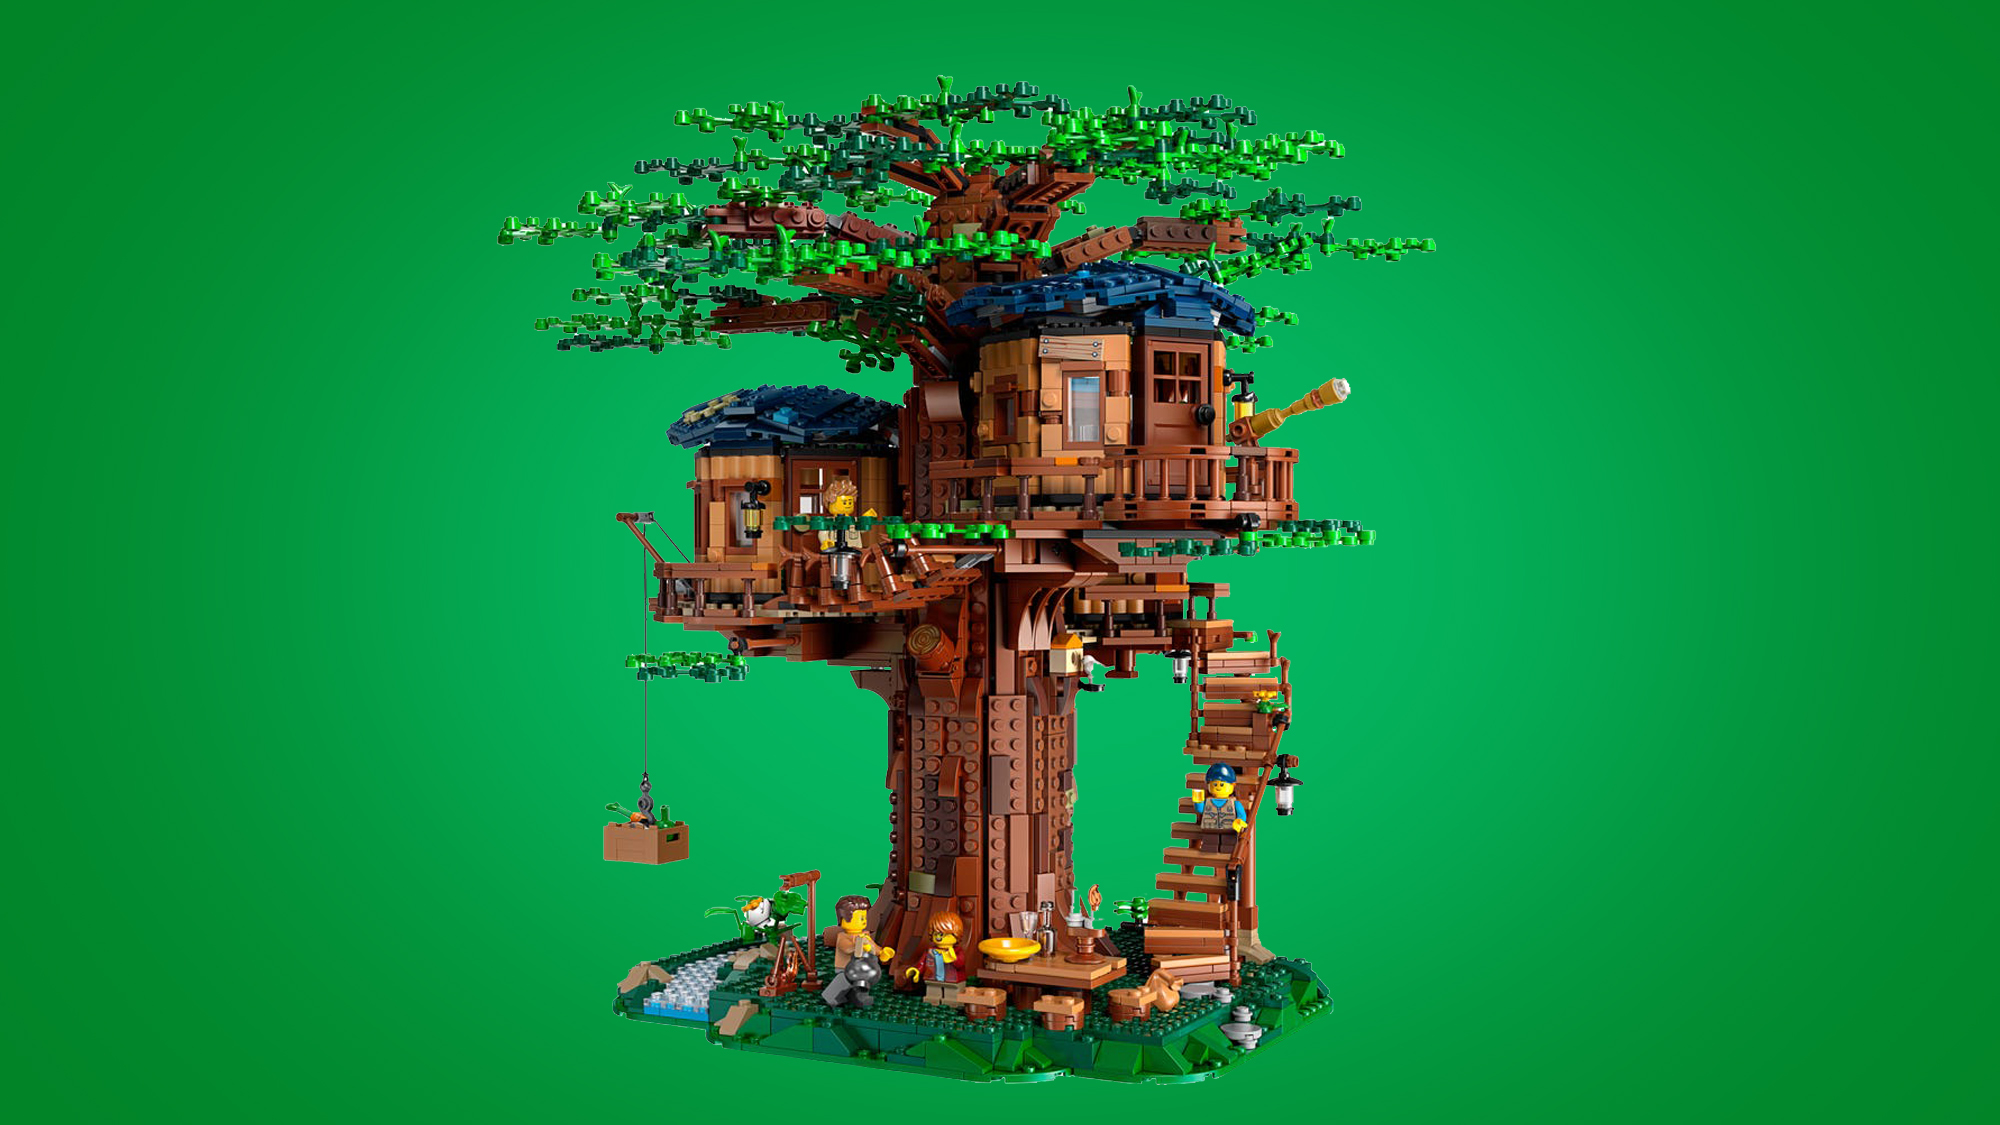 Best Lego sets